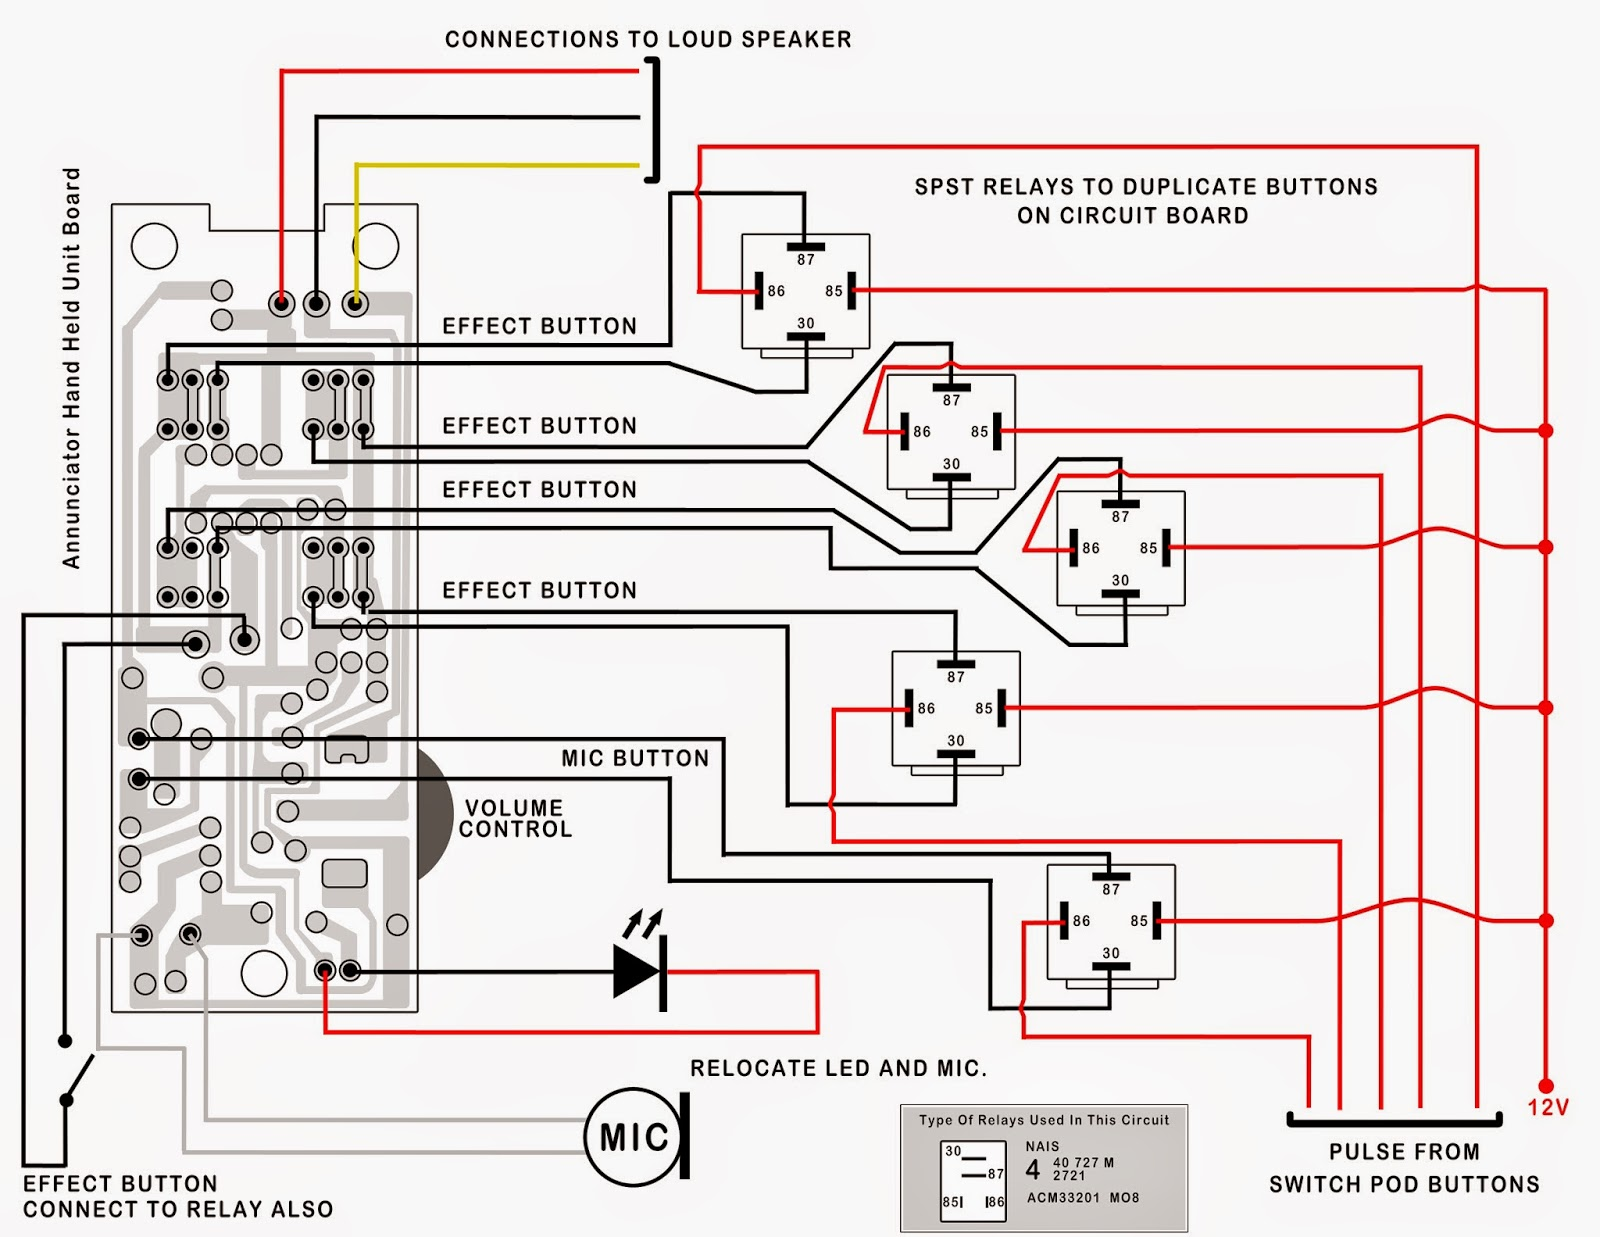 hight resolution of 4l60e sd sensor wiring diagram neutral safety switch 4l60e plug diagram 1999 silver 4l60e plug diagram 1999 silver